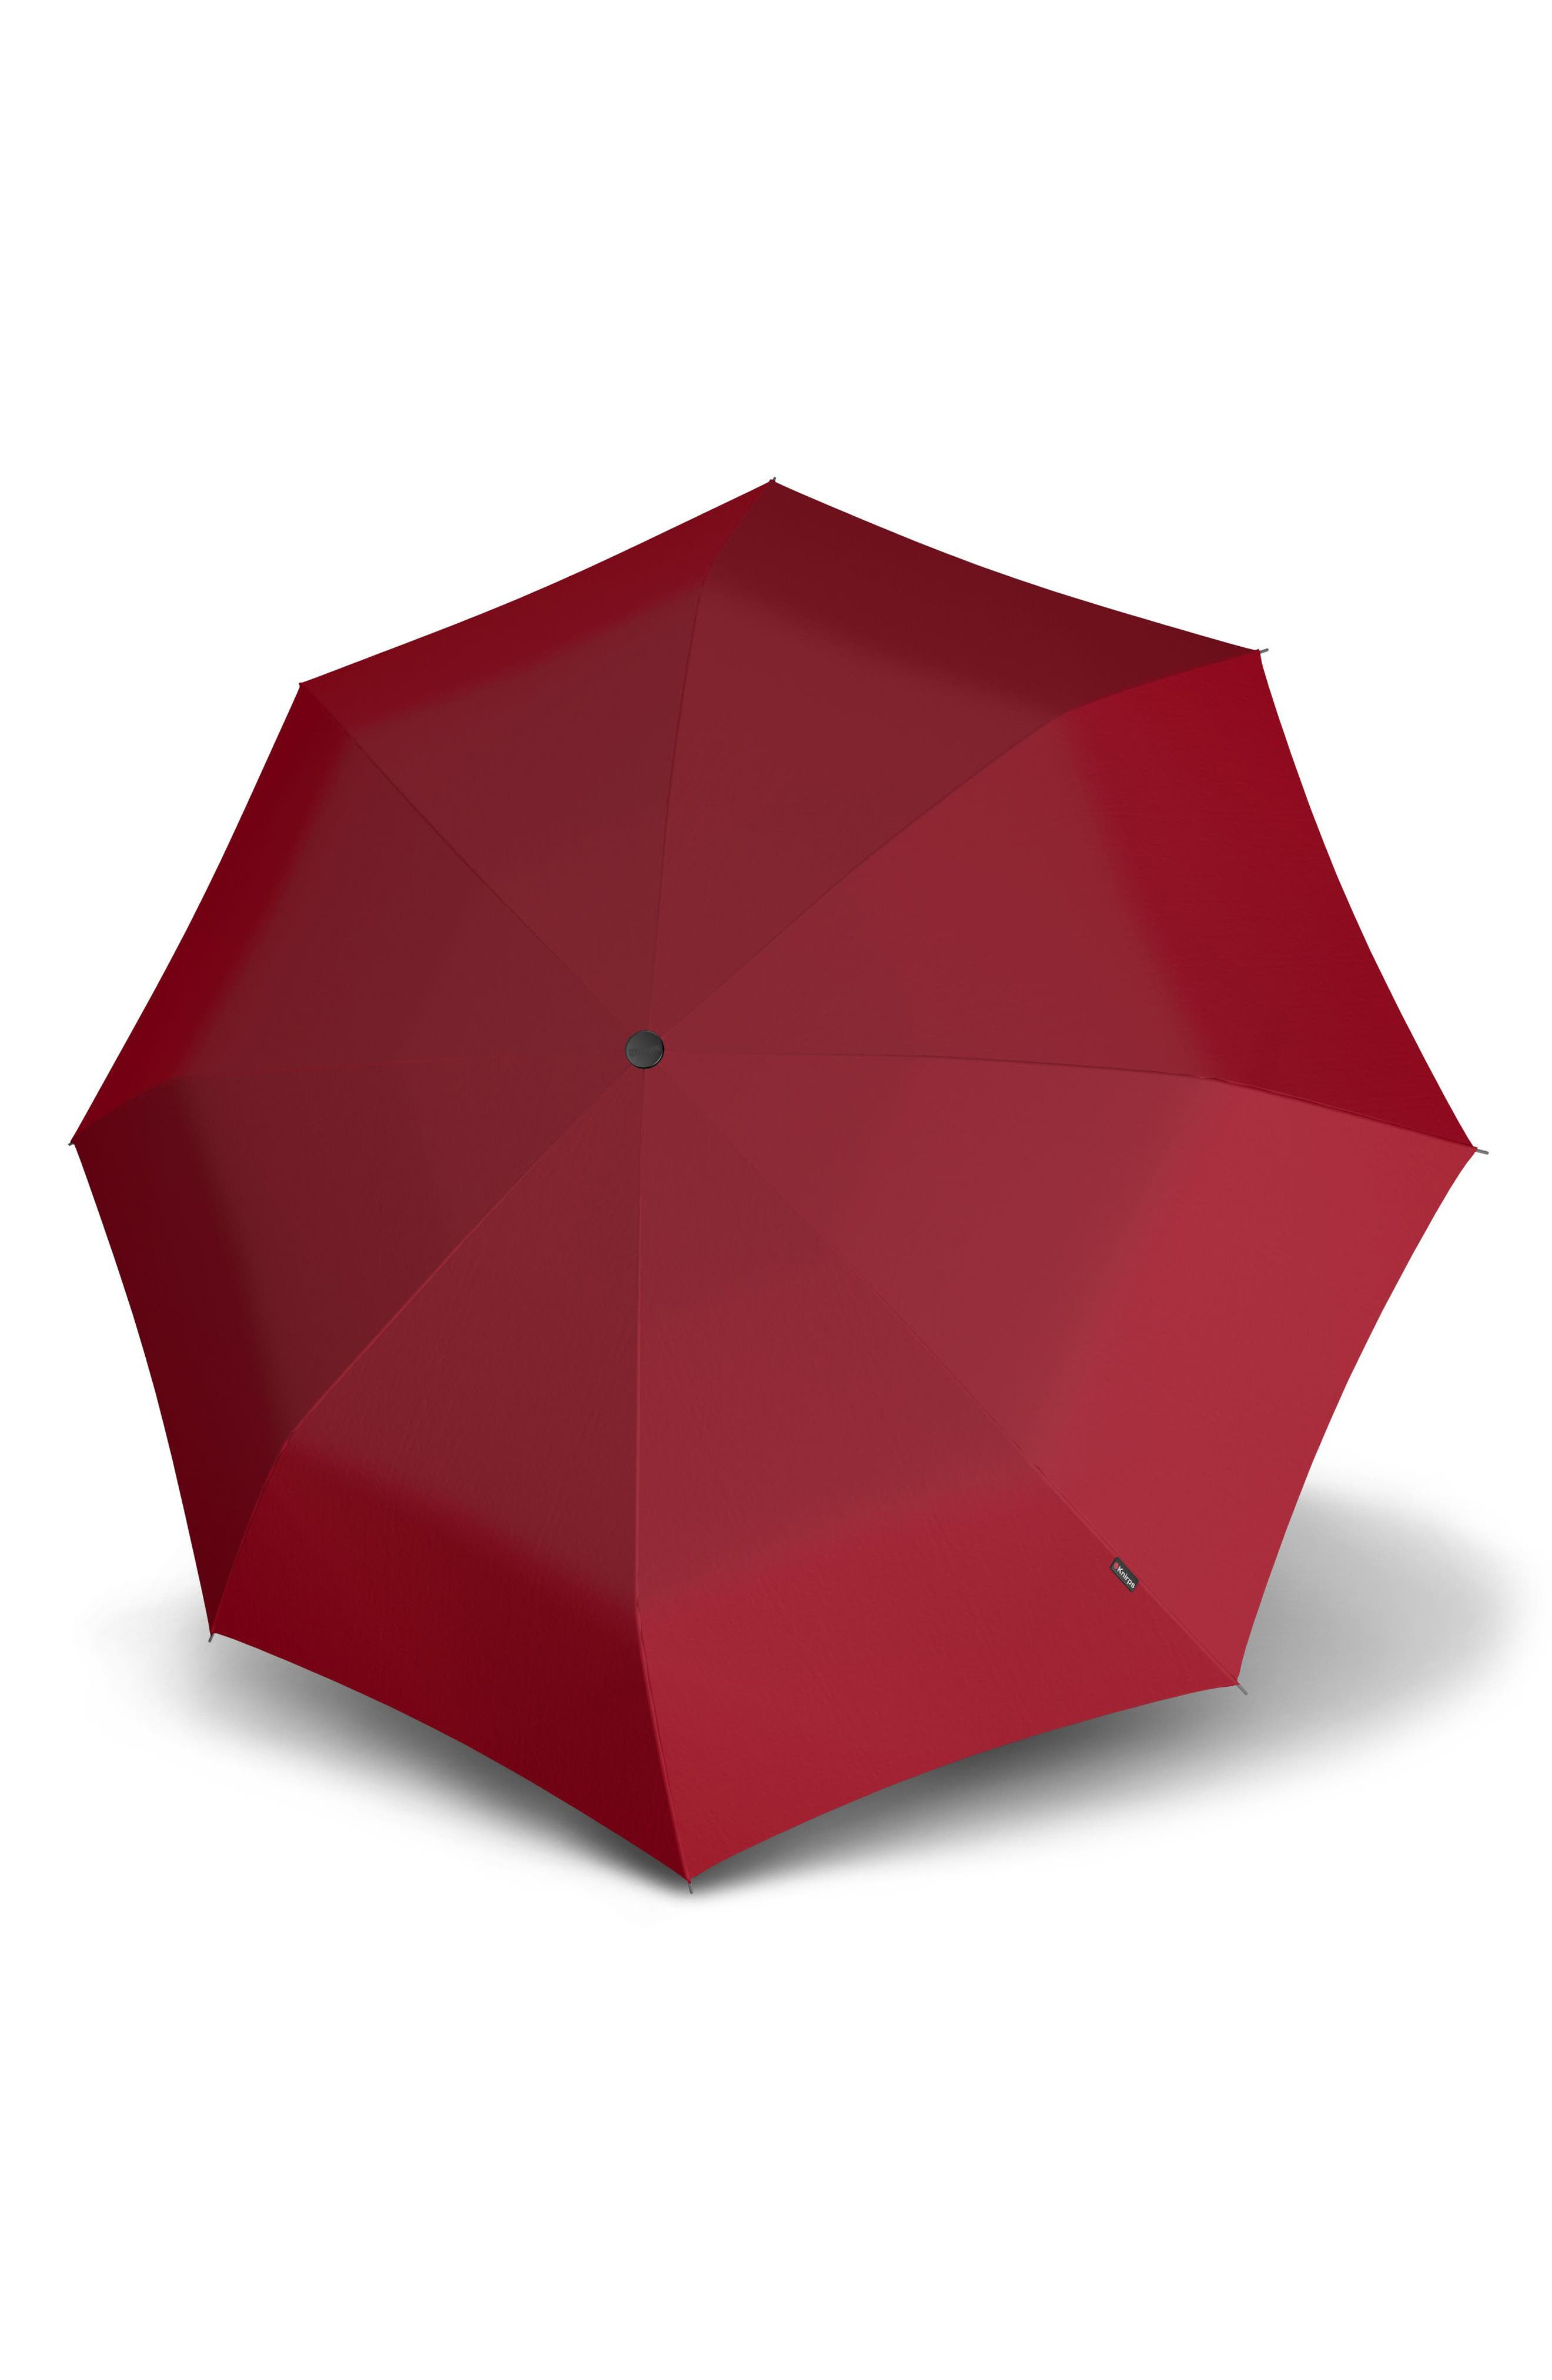 Compact Duomatic Umbrella,                         Main,                         color, RED